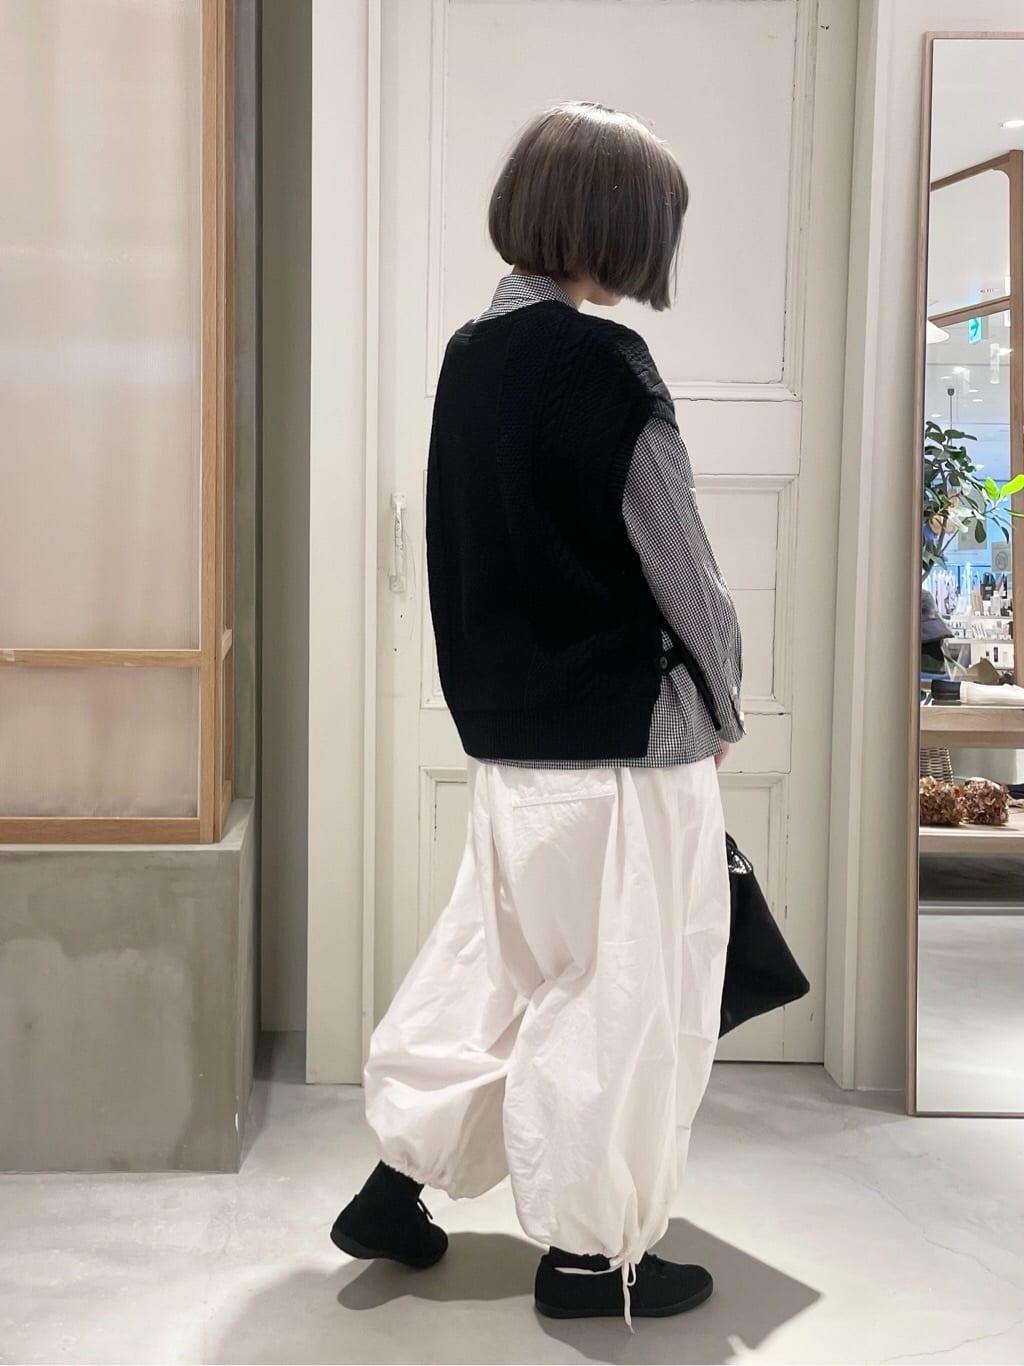 bulle de savon 渋谷スクランブルスクエア 身長:154cm 2021.09.16